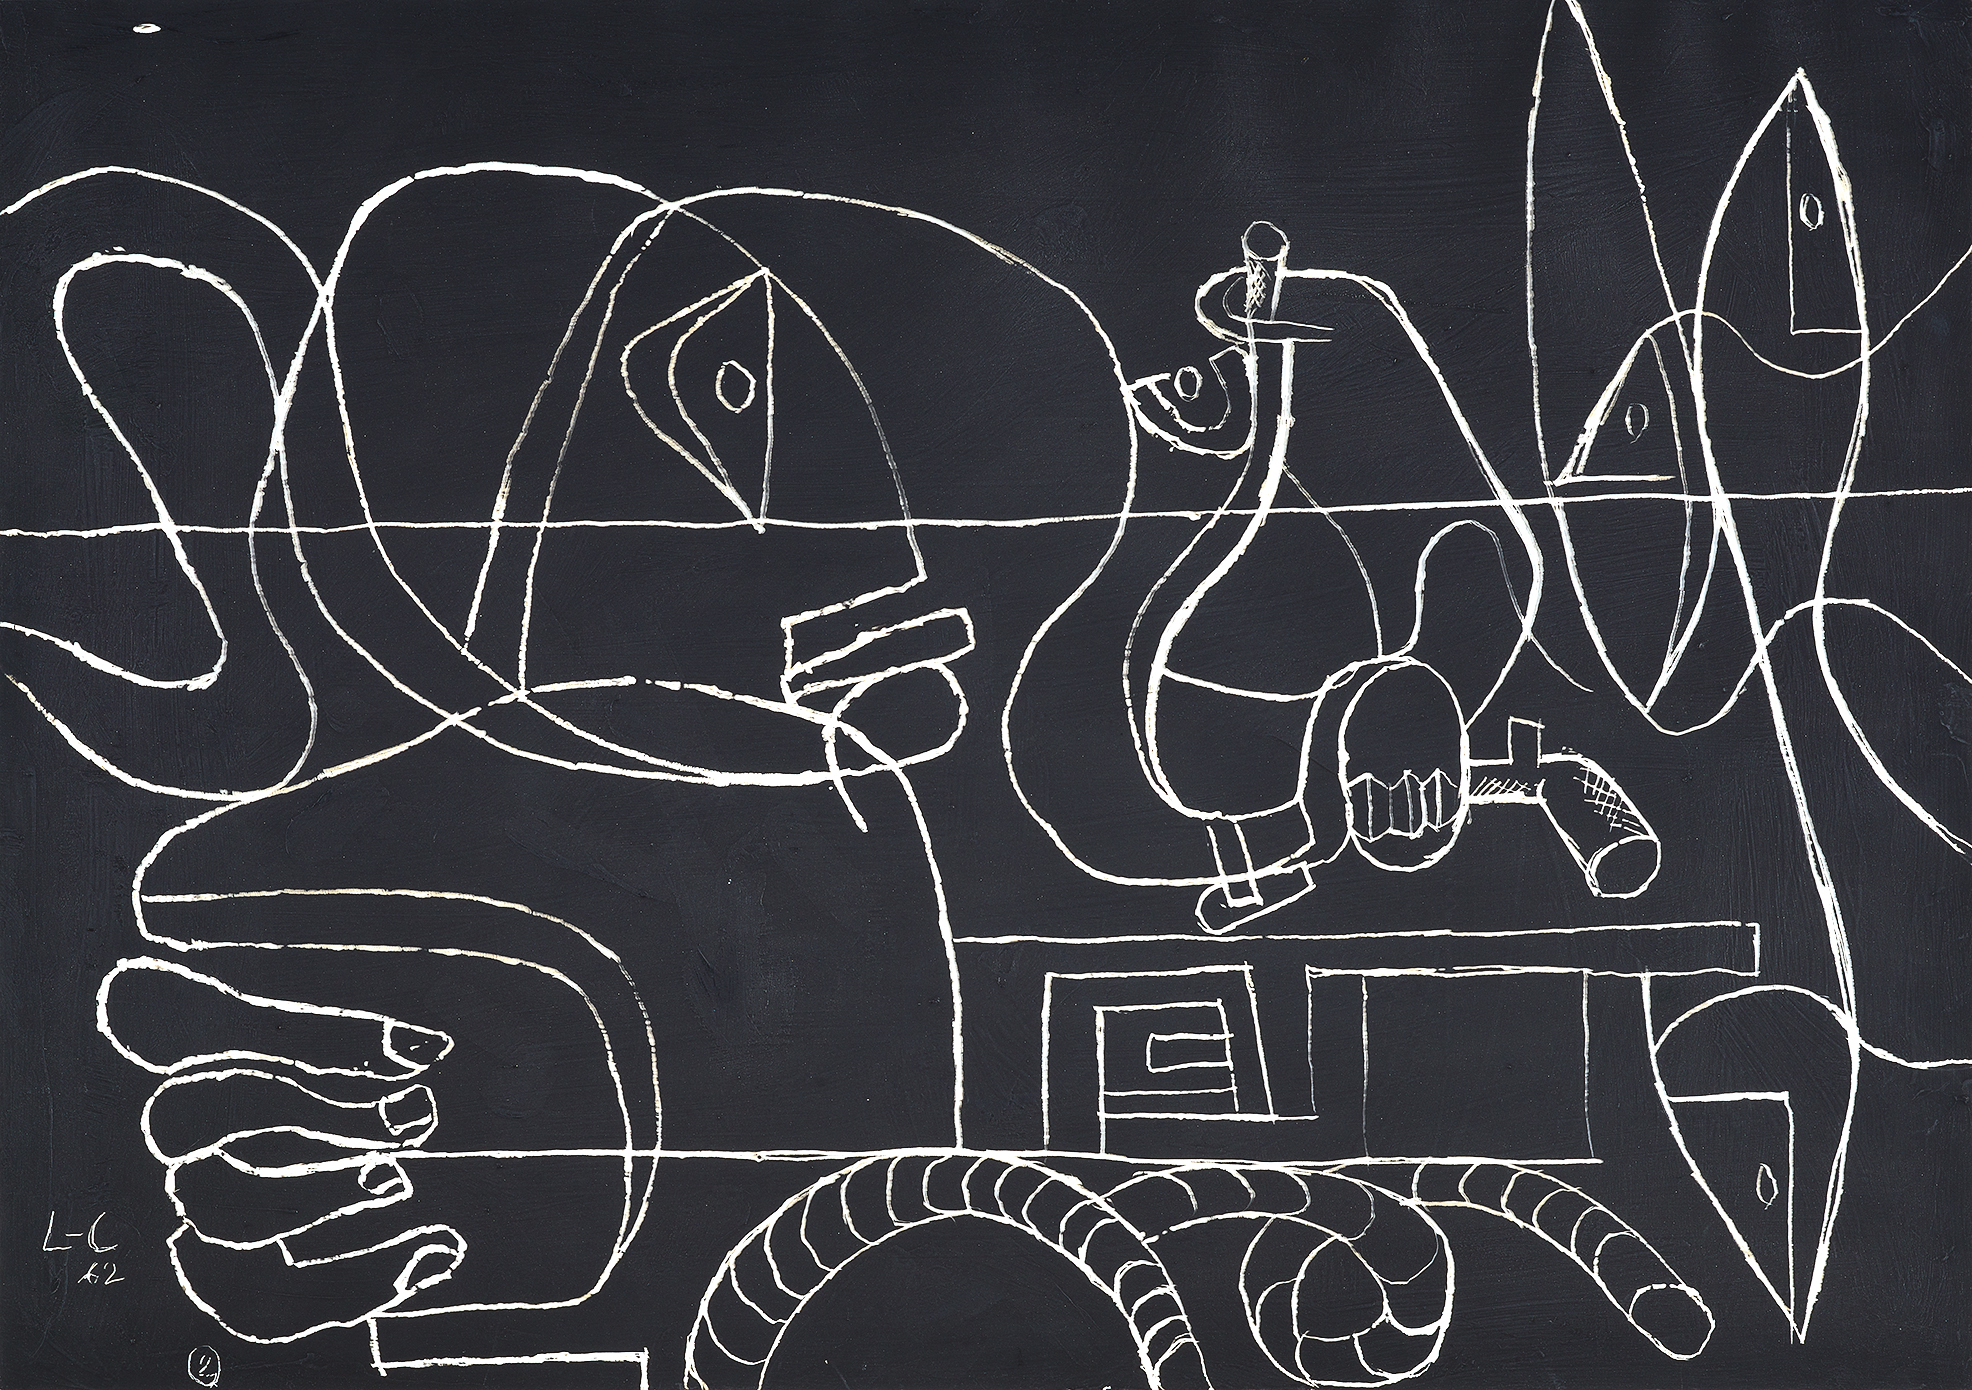 Corbusier Le, Figure, carafes, verre, pipe, poissons et cordage